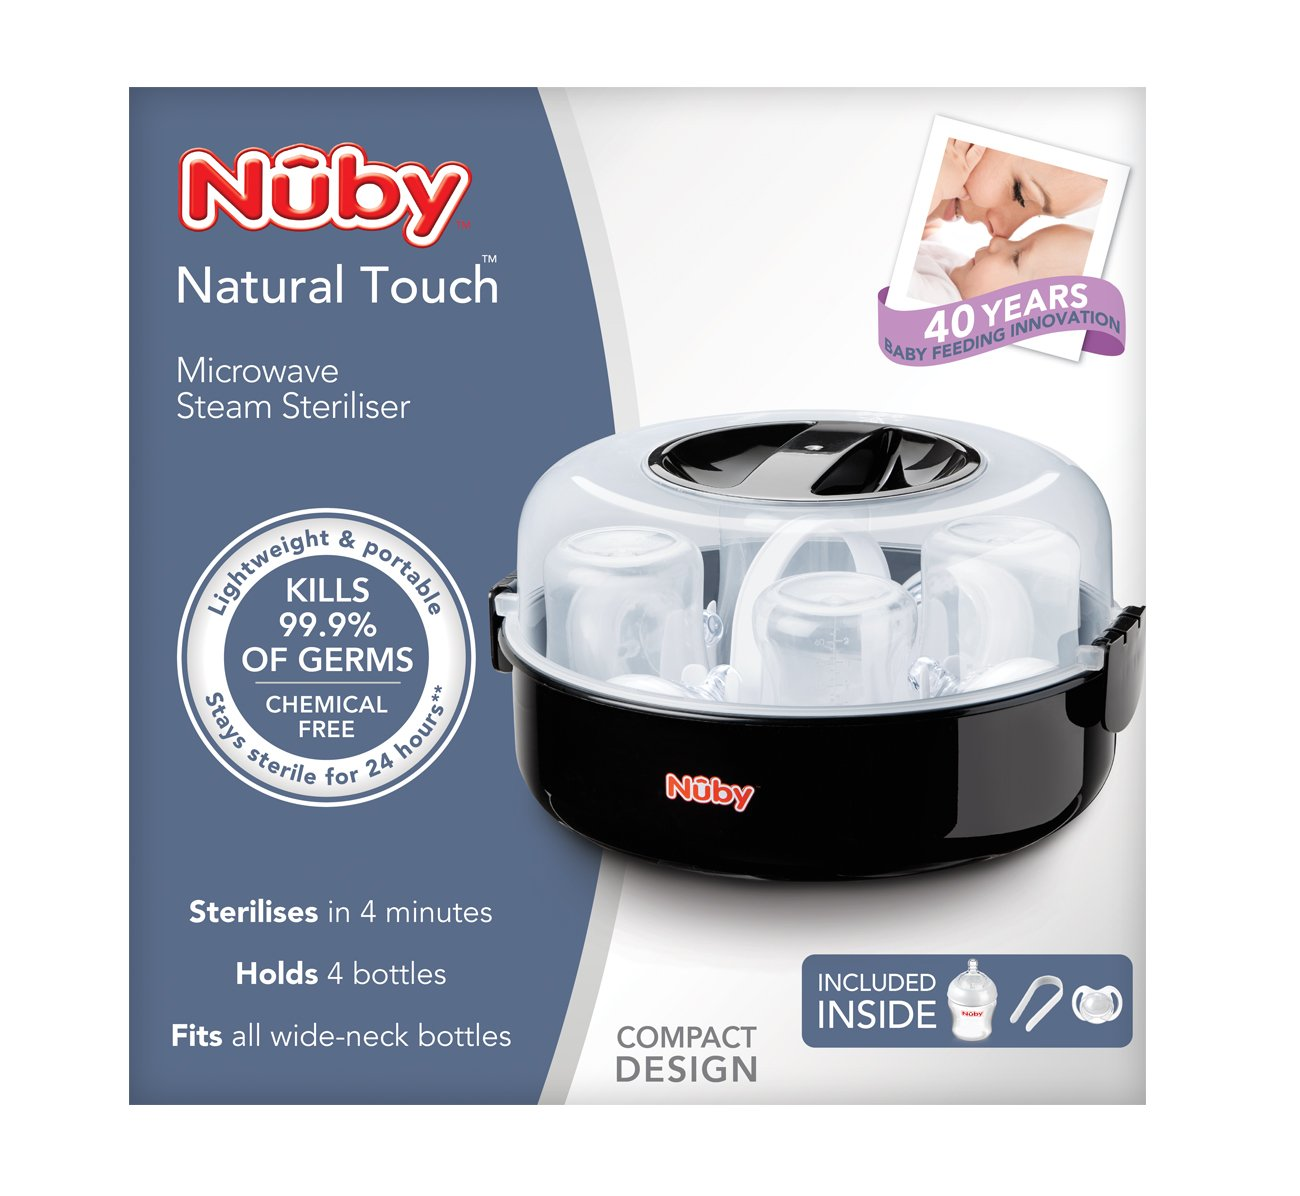 Nuby Natural Touch Microwave Steam Steriliser